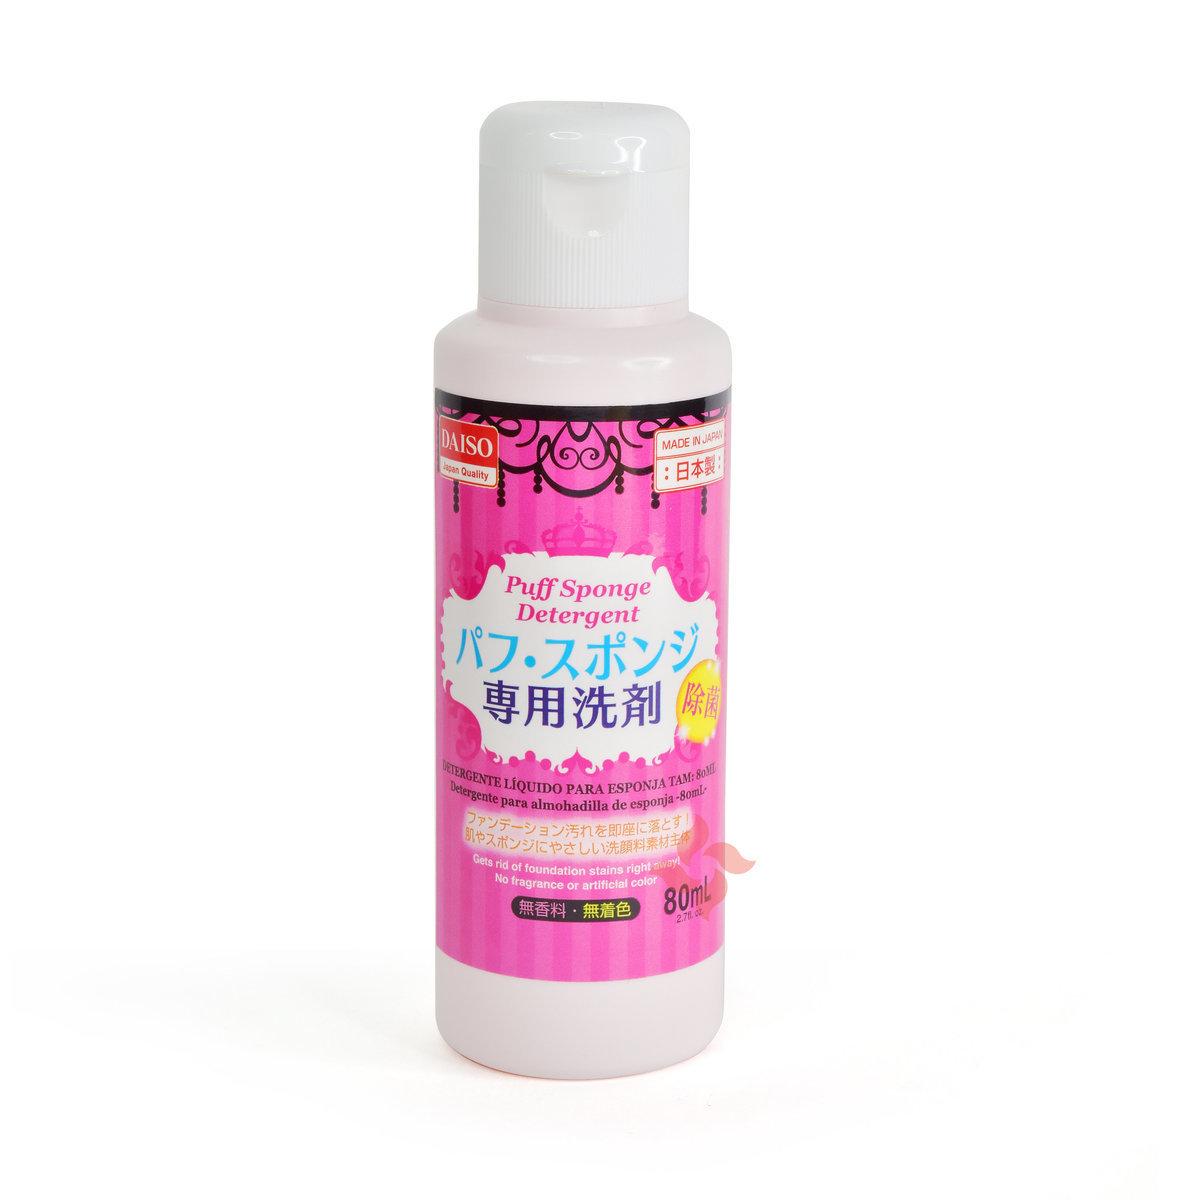 Daiso   大創 粉撲海綿專用清洗液 80ml (平行進口)   香港電視 HKTVmall 網上購物